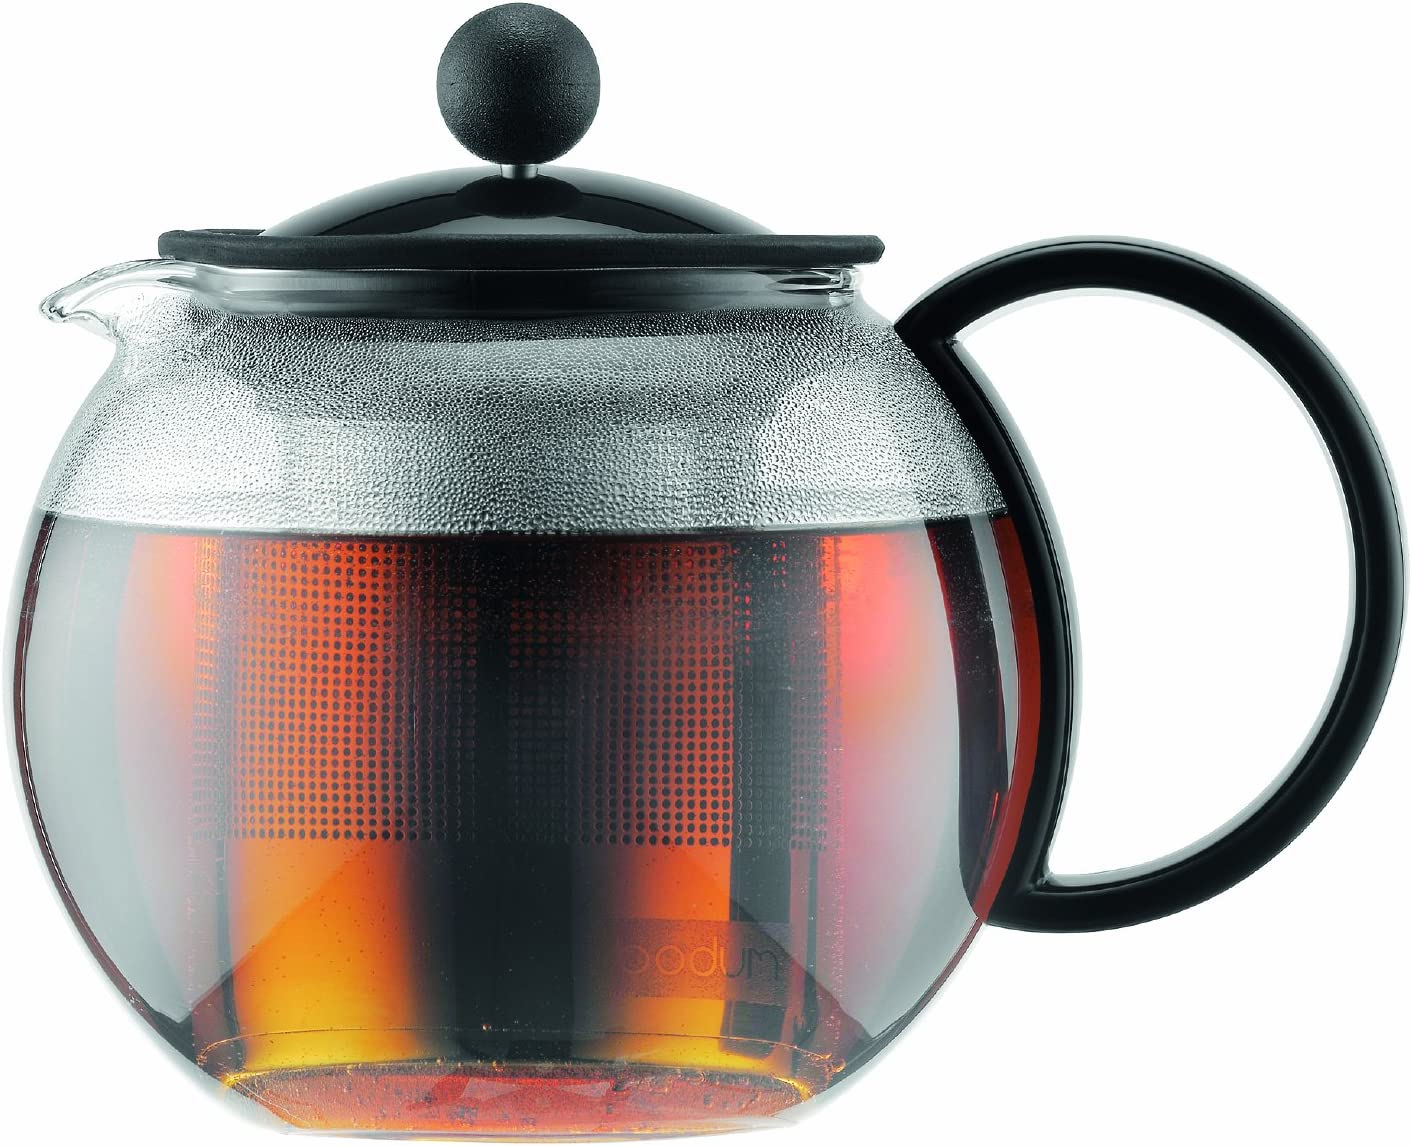 Bodum Assam - Tea Press - Black Lid & Handle, Stainless Steel Filter - 0.5l, 17oz